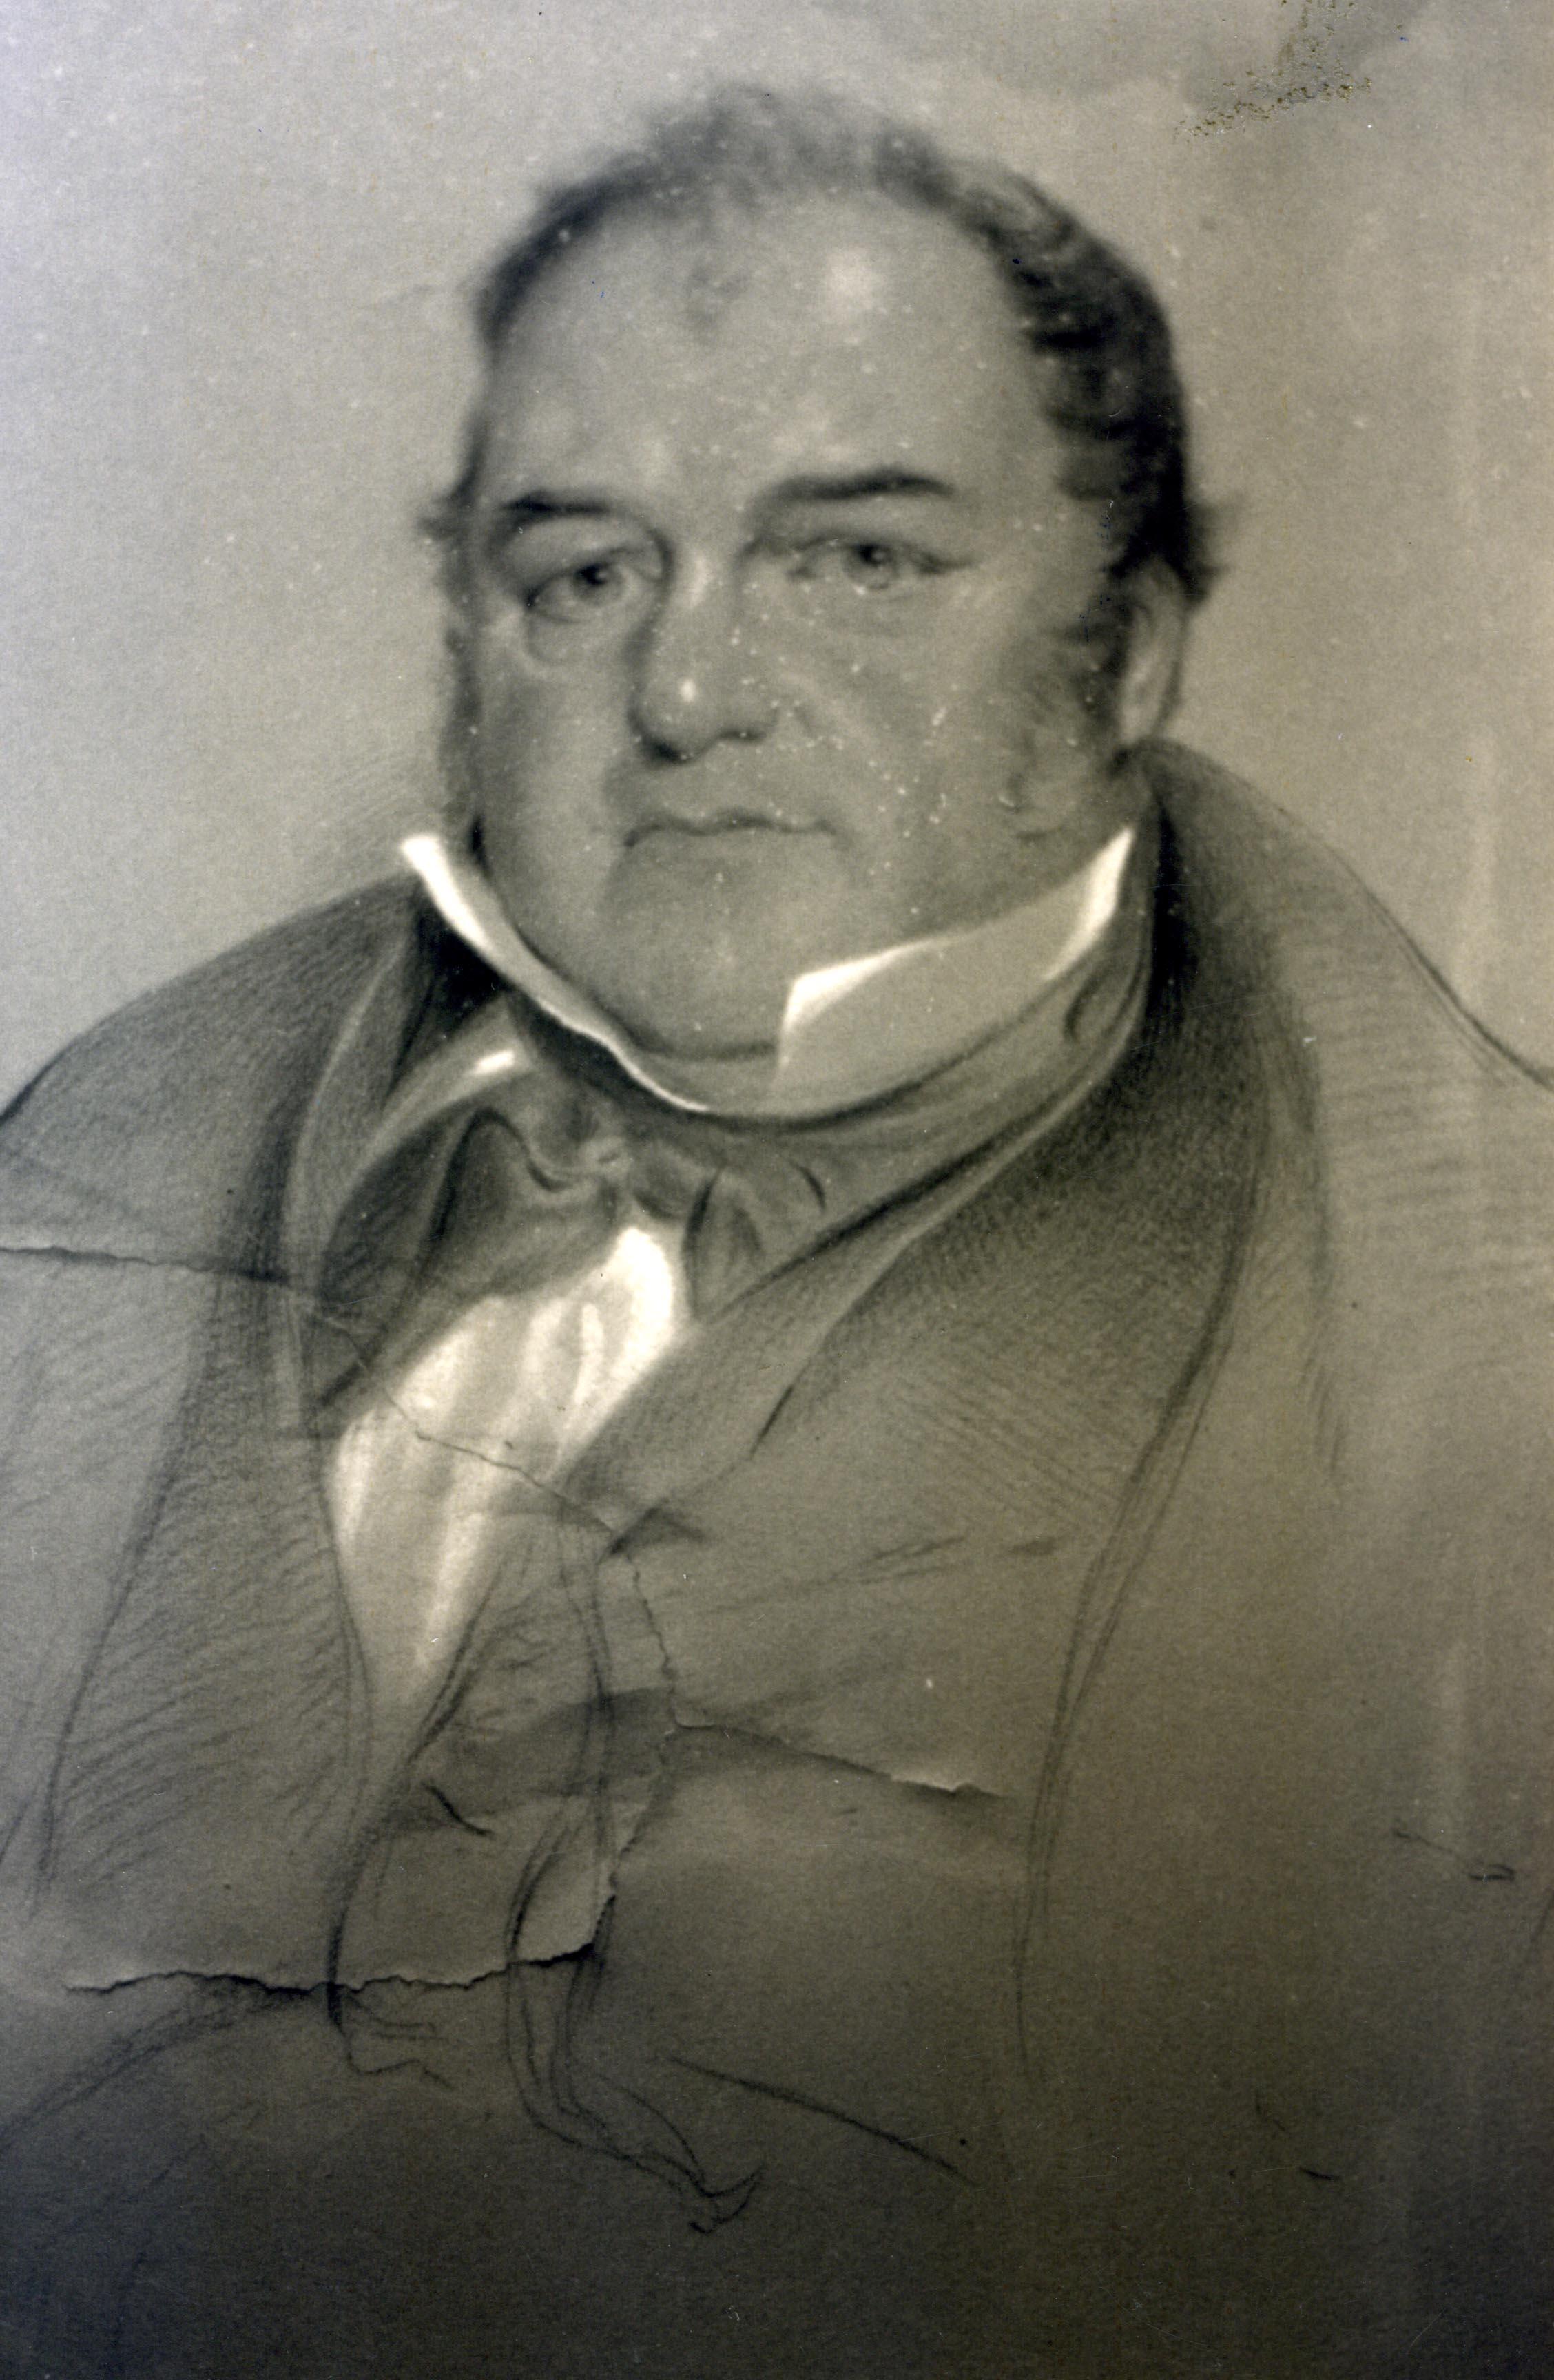 George Meredith richard webber